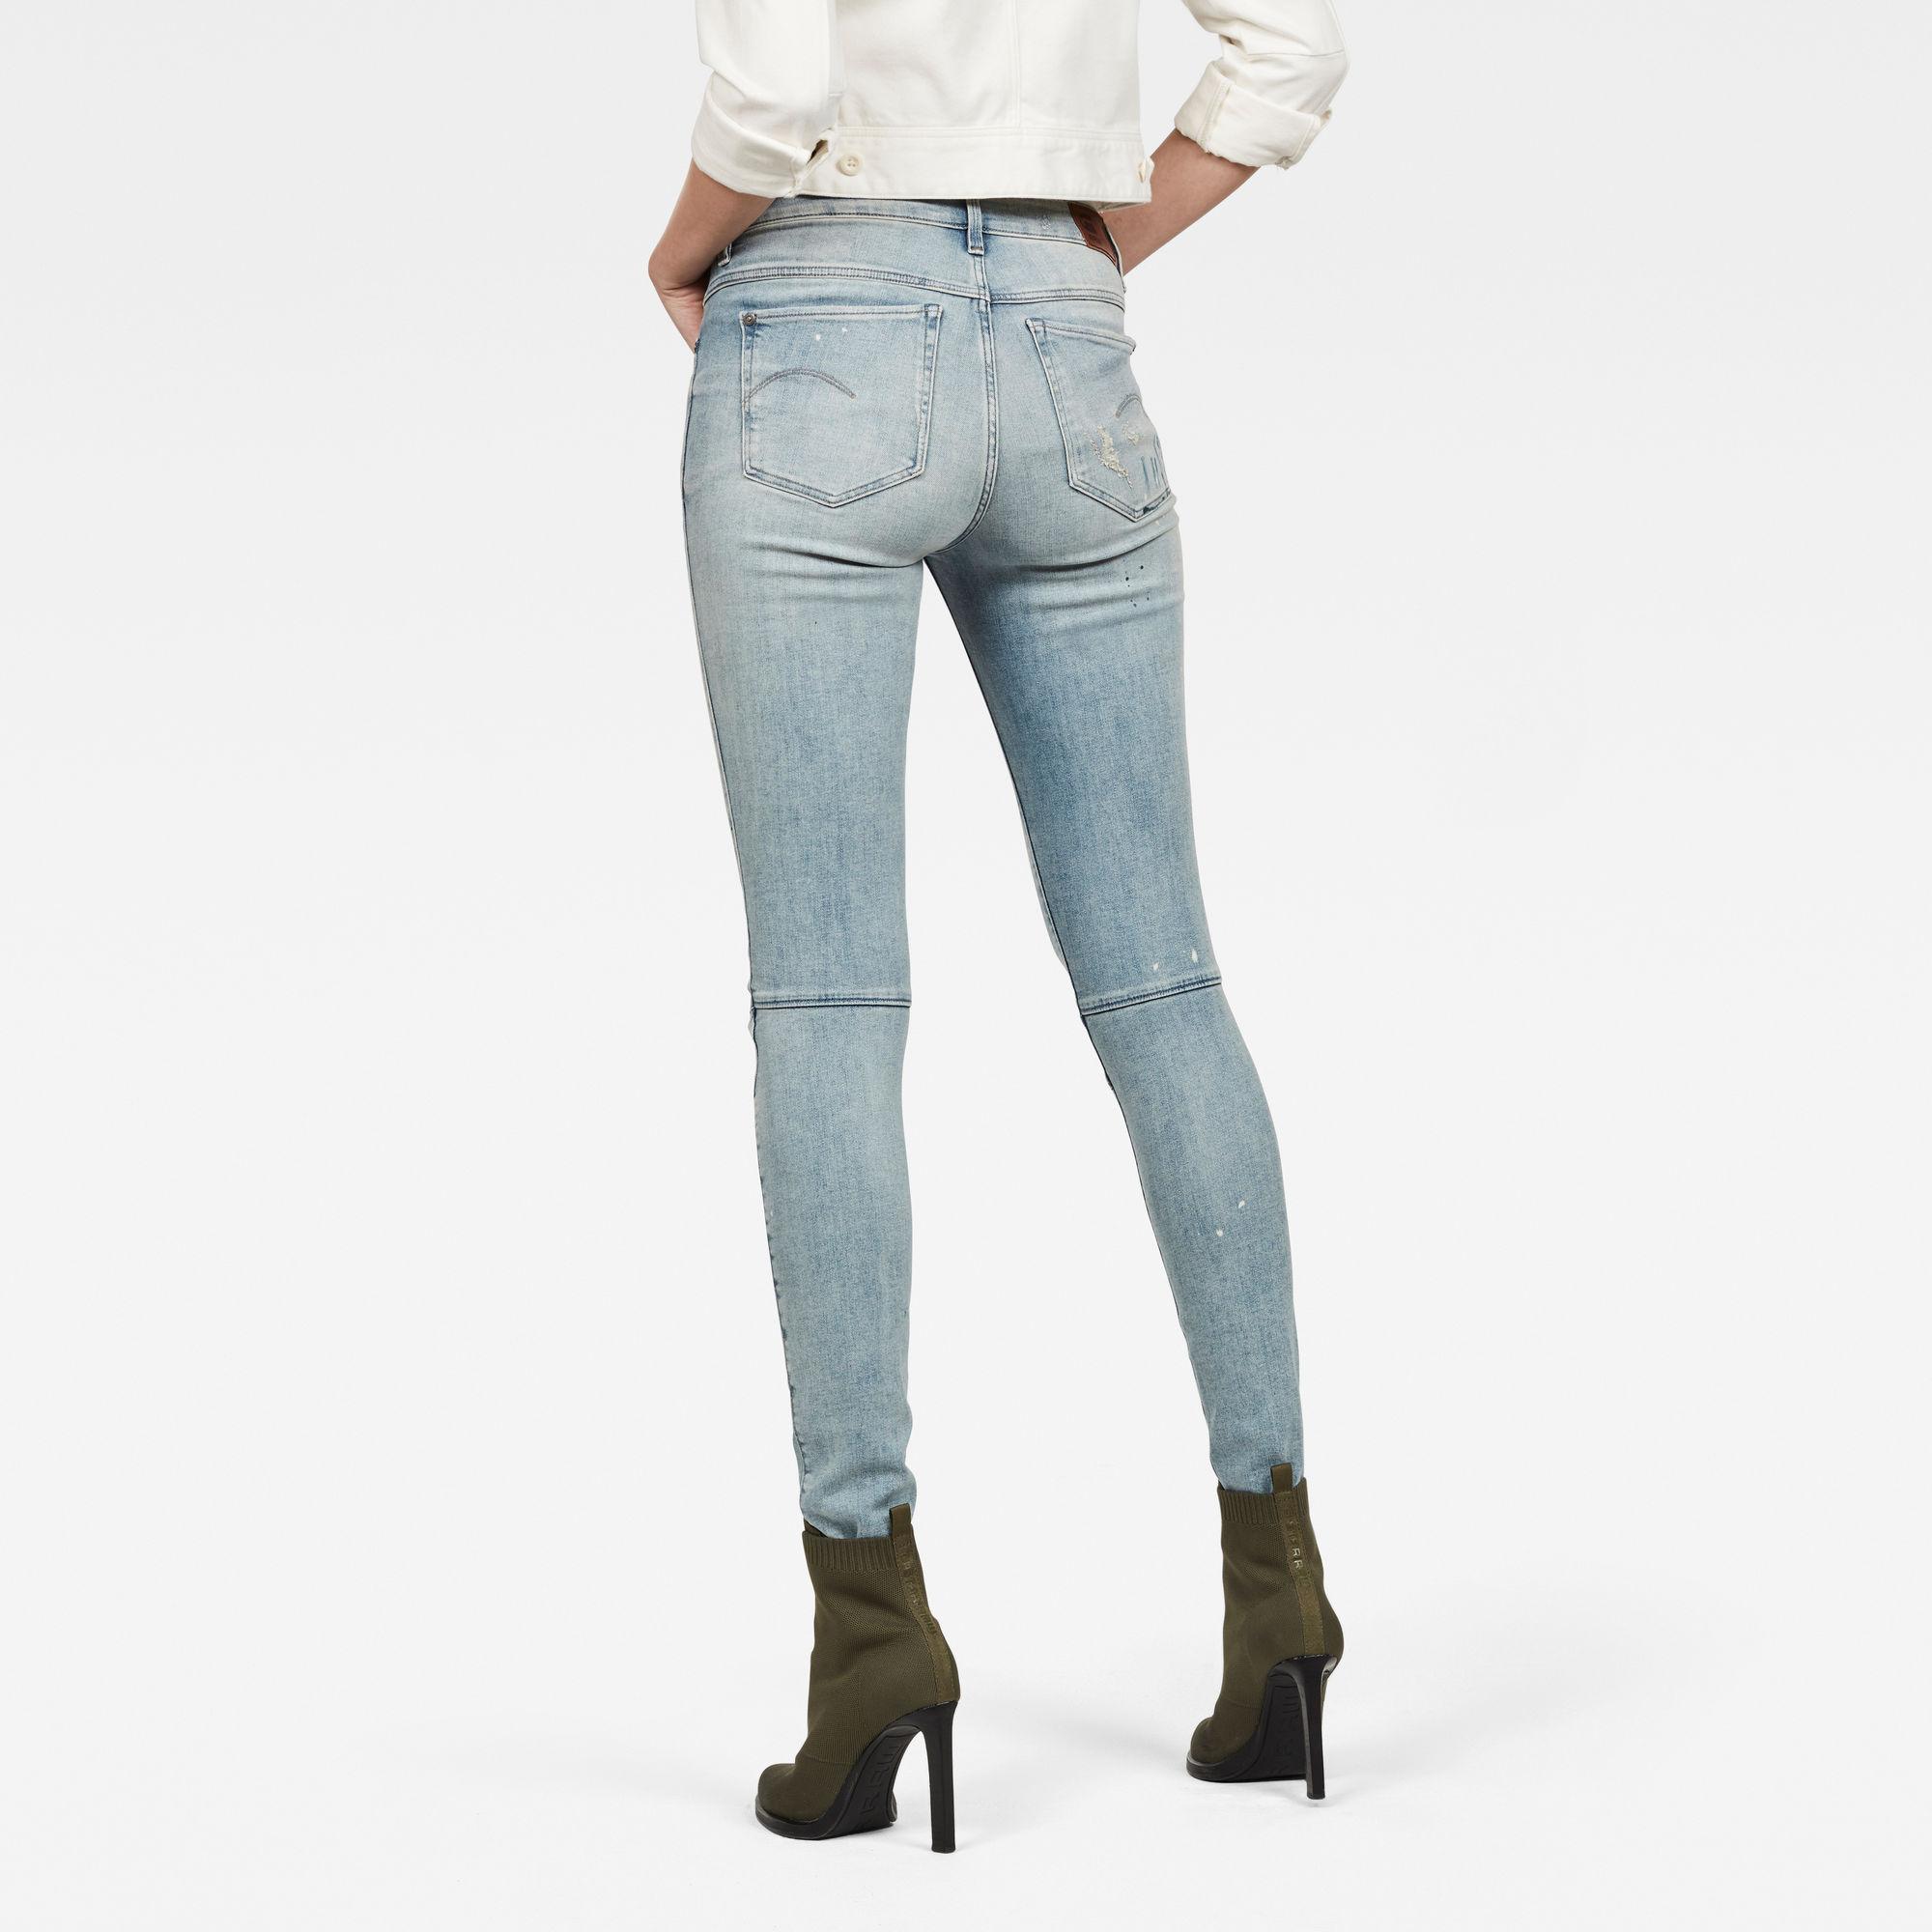 G-Star RAW Biwes High Skinny Jeans